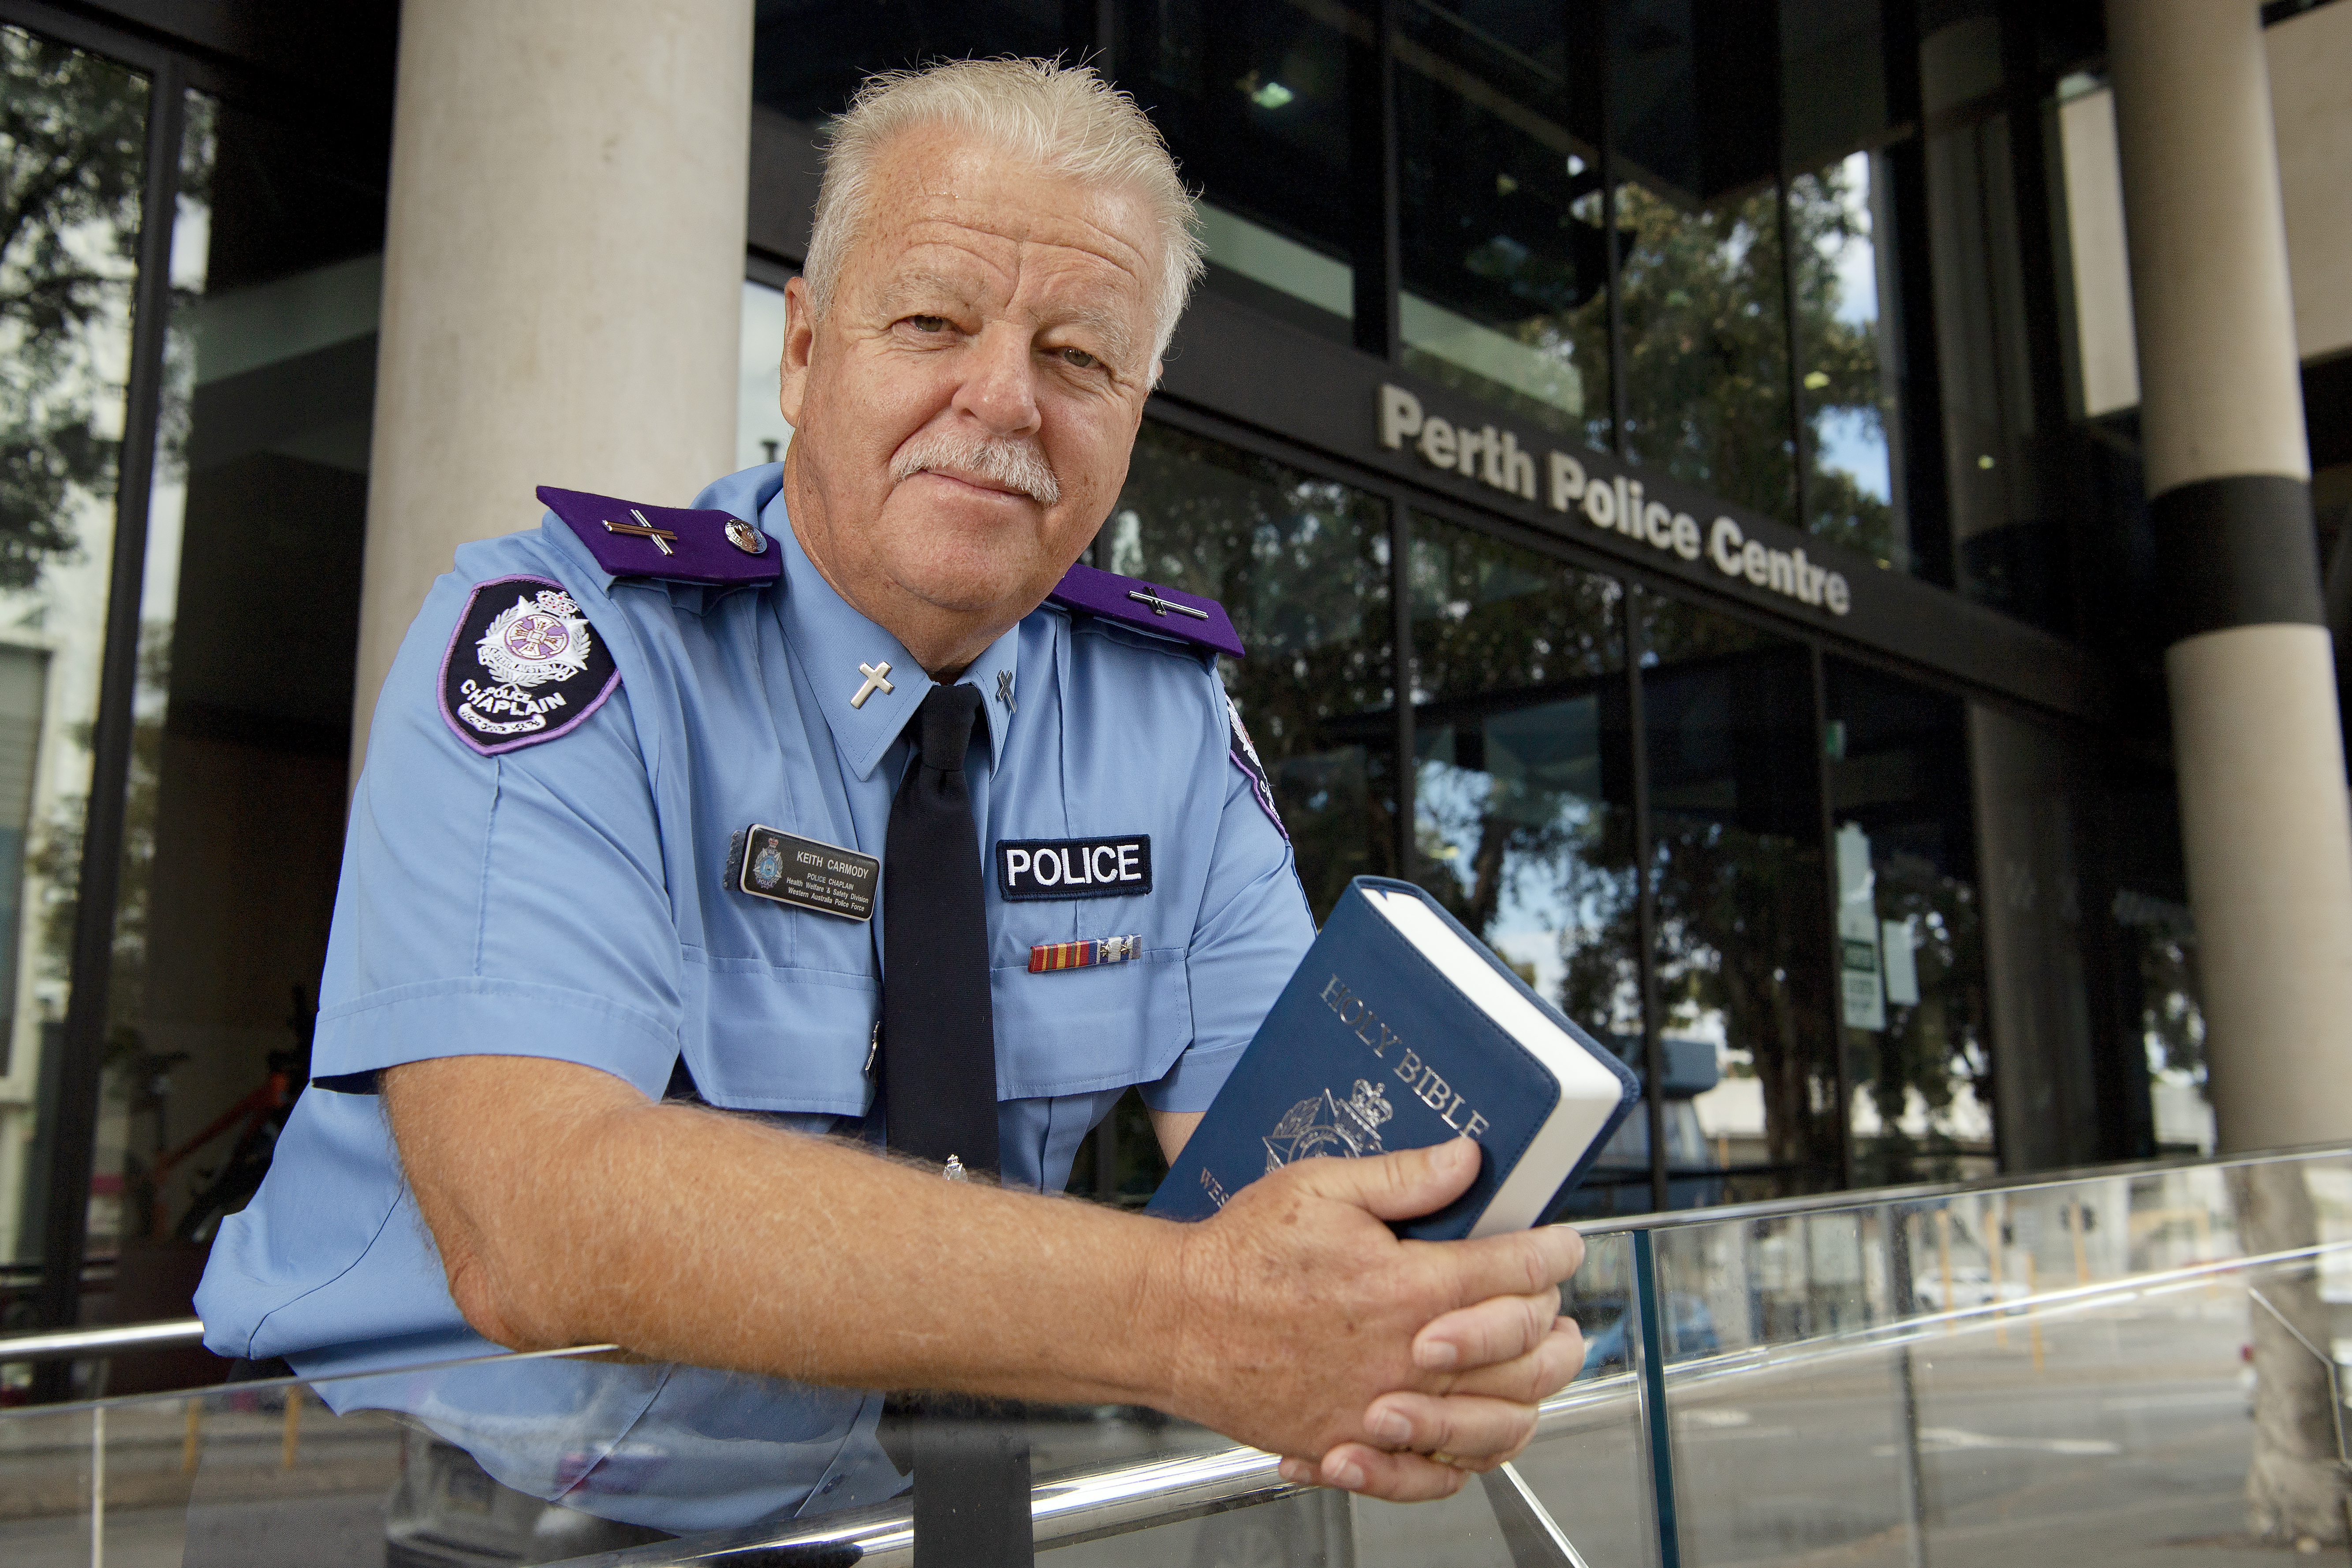 PoliceChaplainKeithCarmody 15